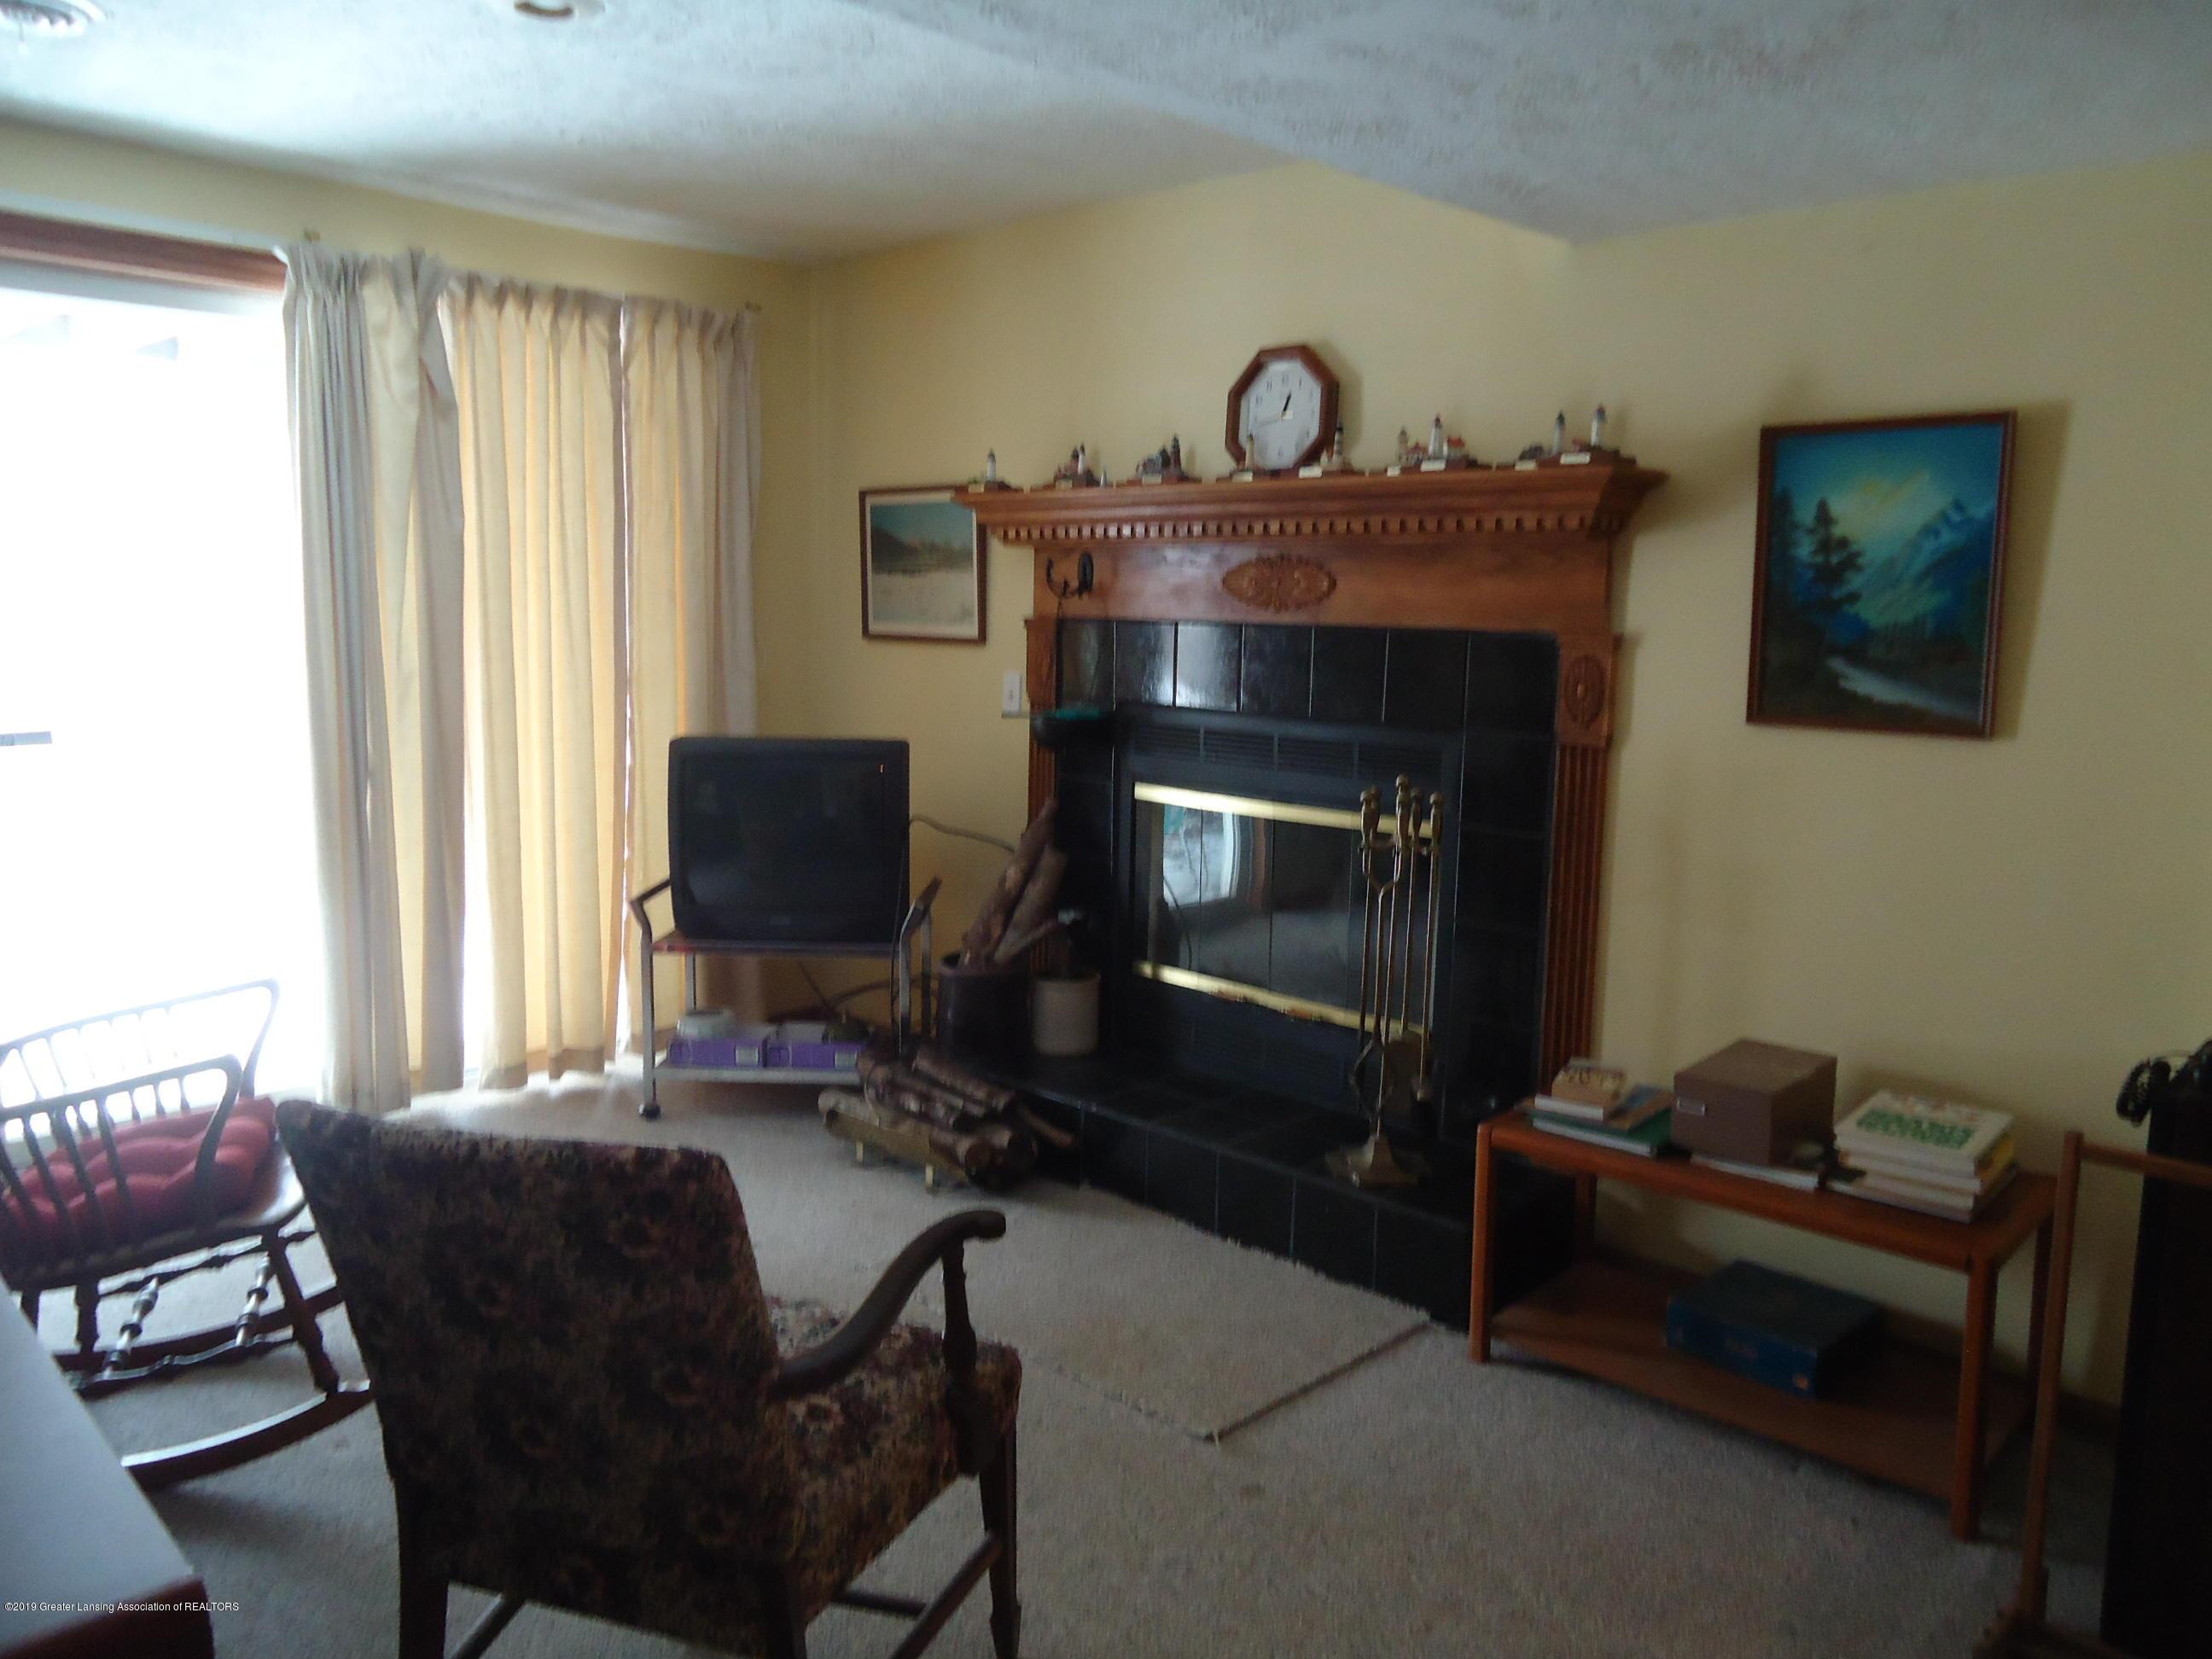 LL Family Room:  130 Canterbury Drive